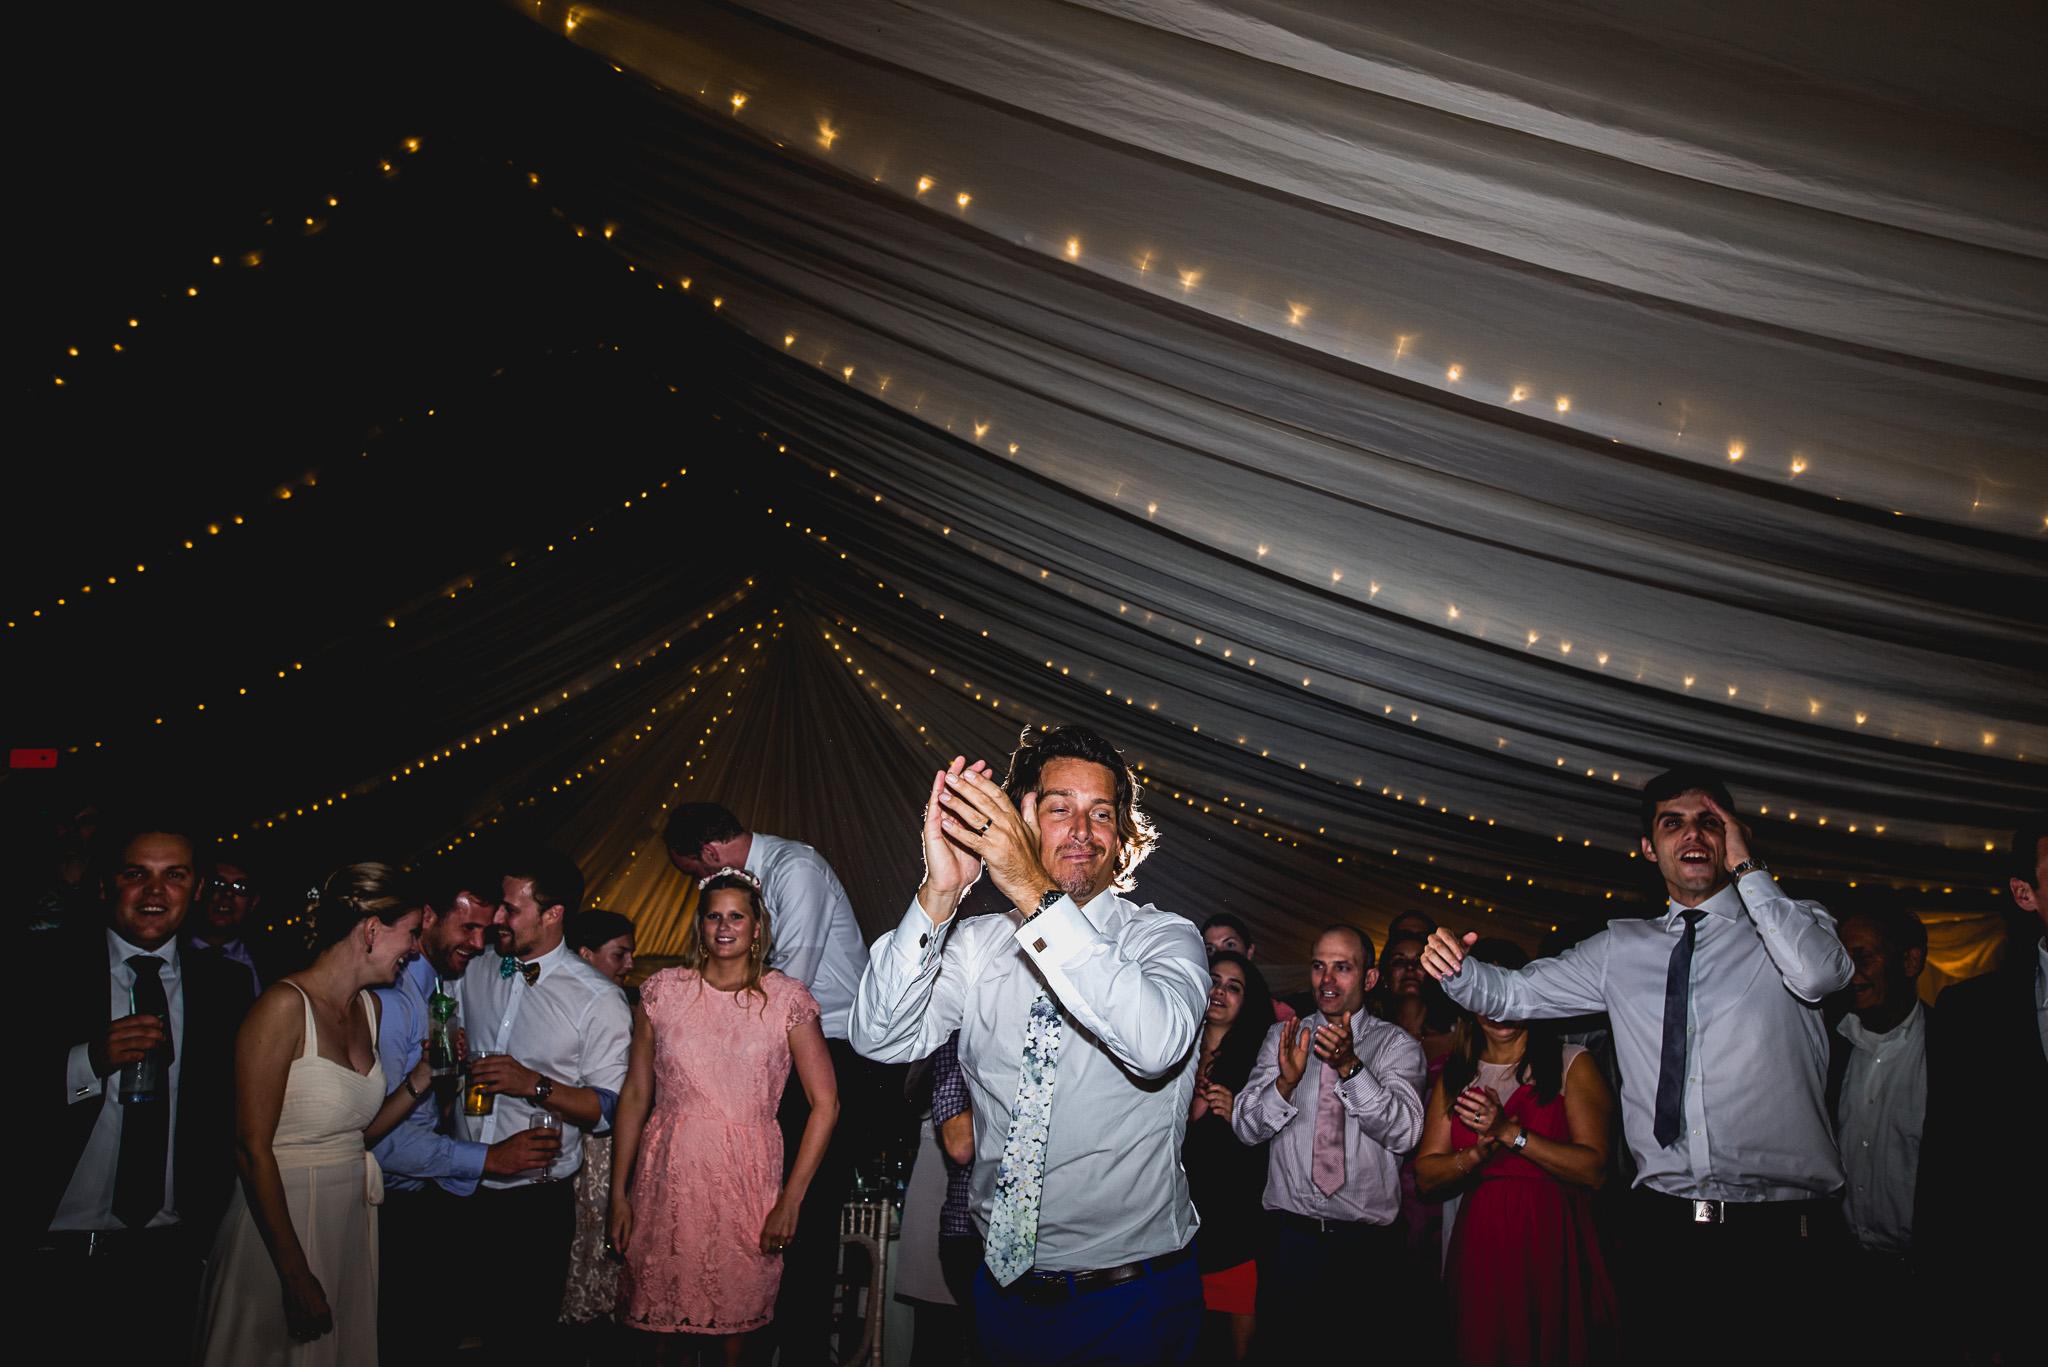 Lara & Jack Wedding 220815 by Barney Walters_1041_BW2_0924